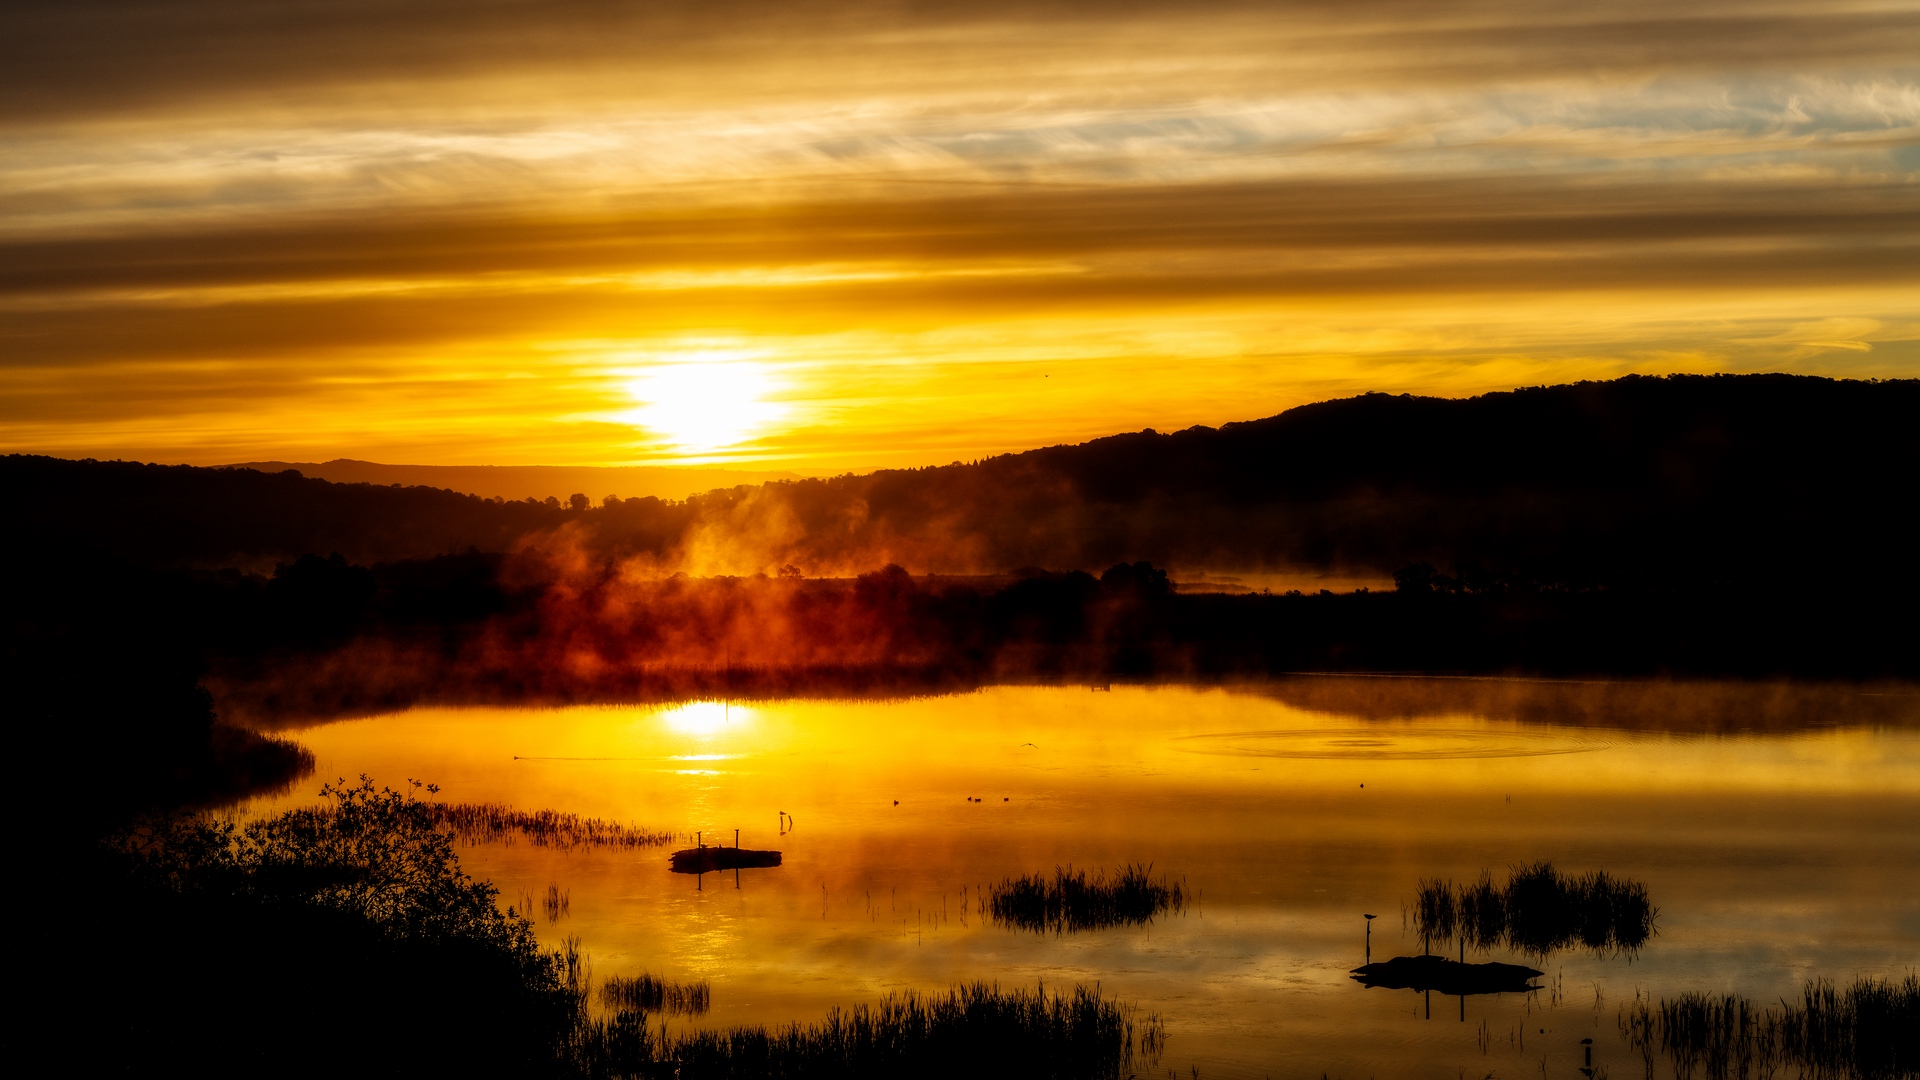 Download wallpaper 1920x1080 lake sunset fog twilight 1920x1080